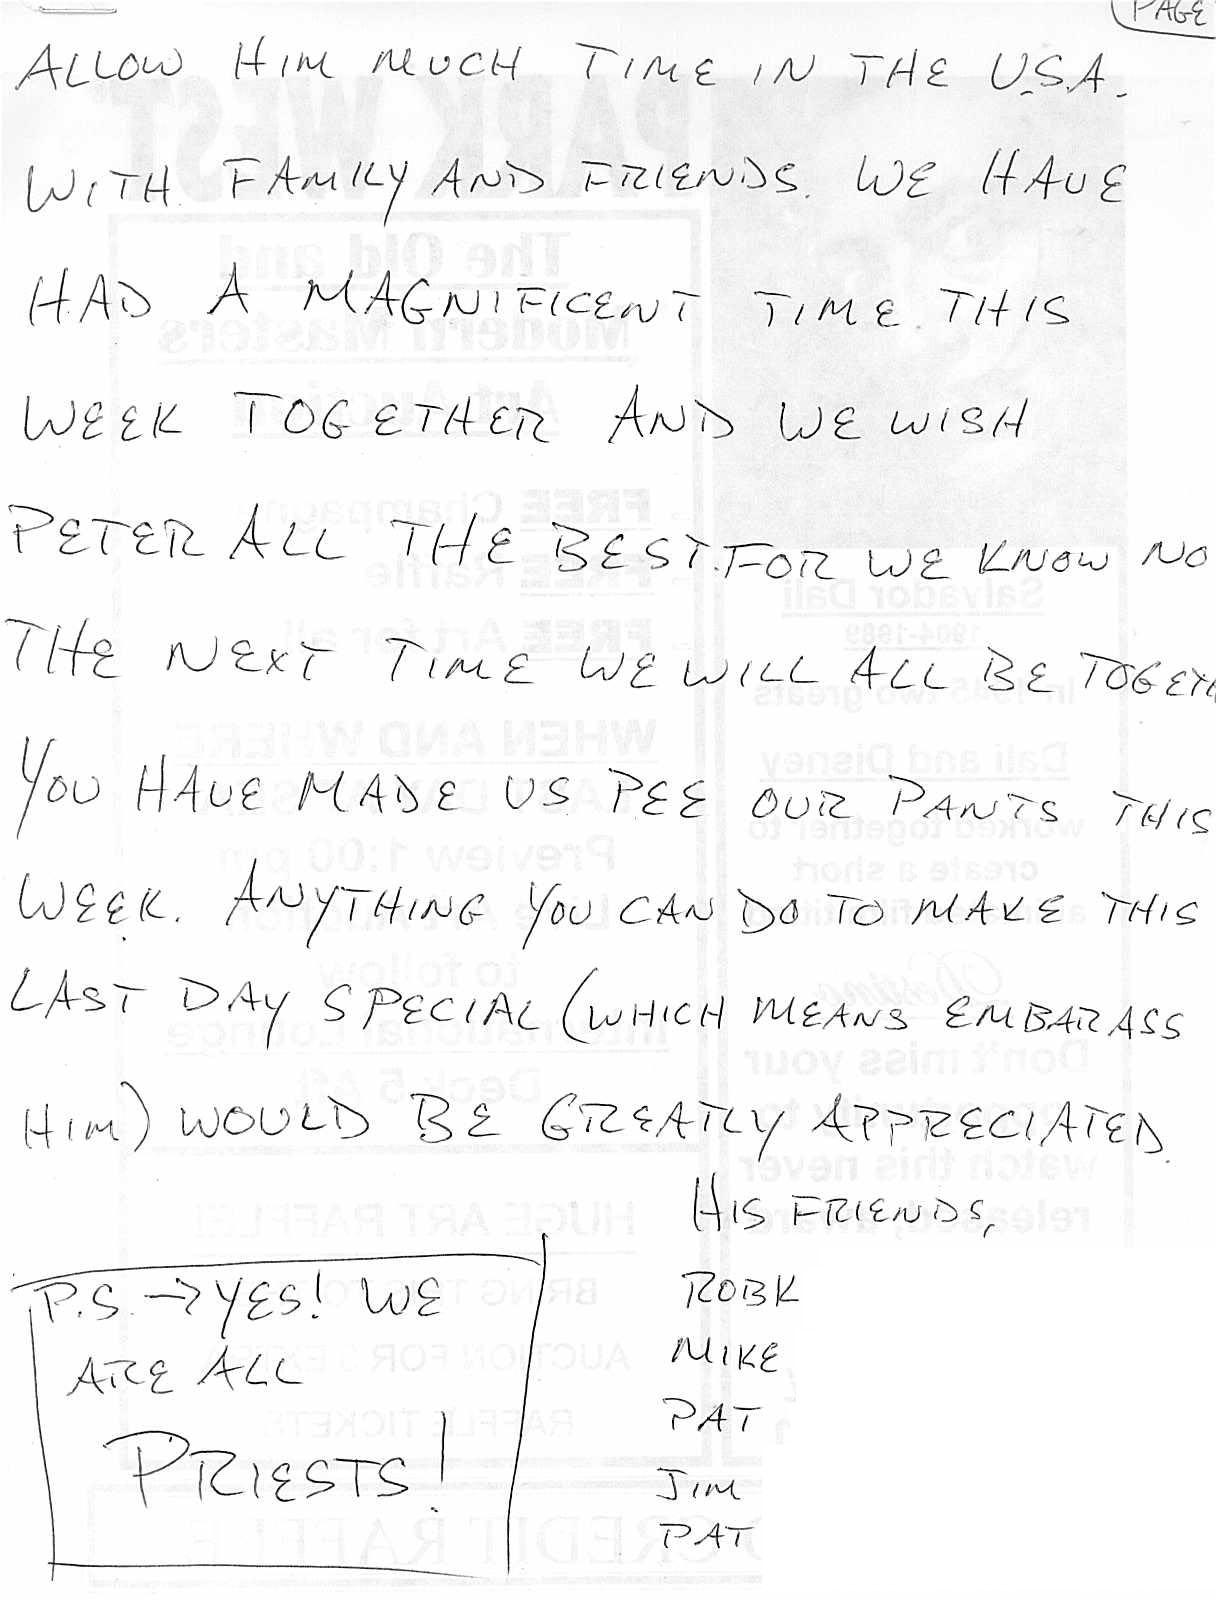 Letter 4 pg 2